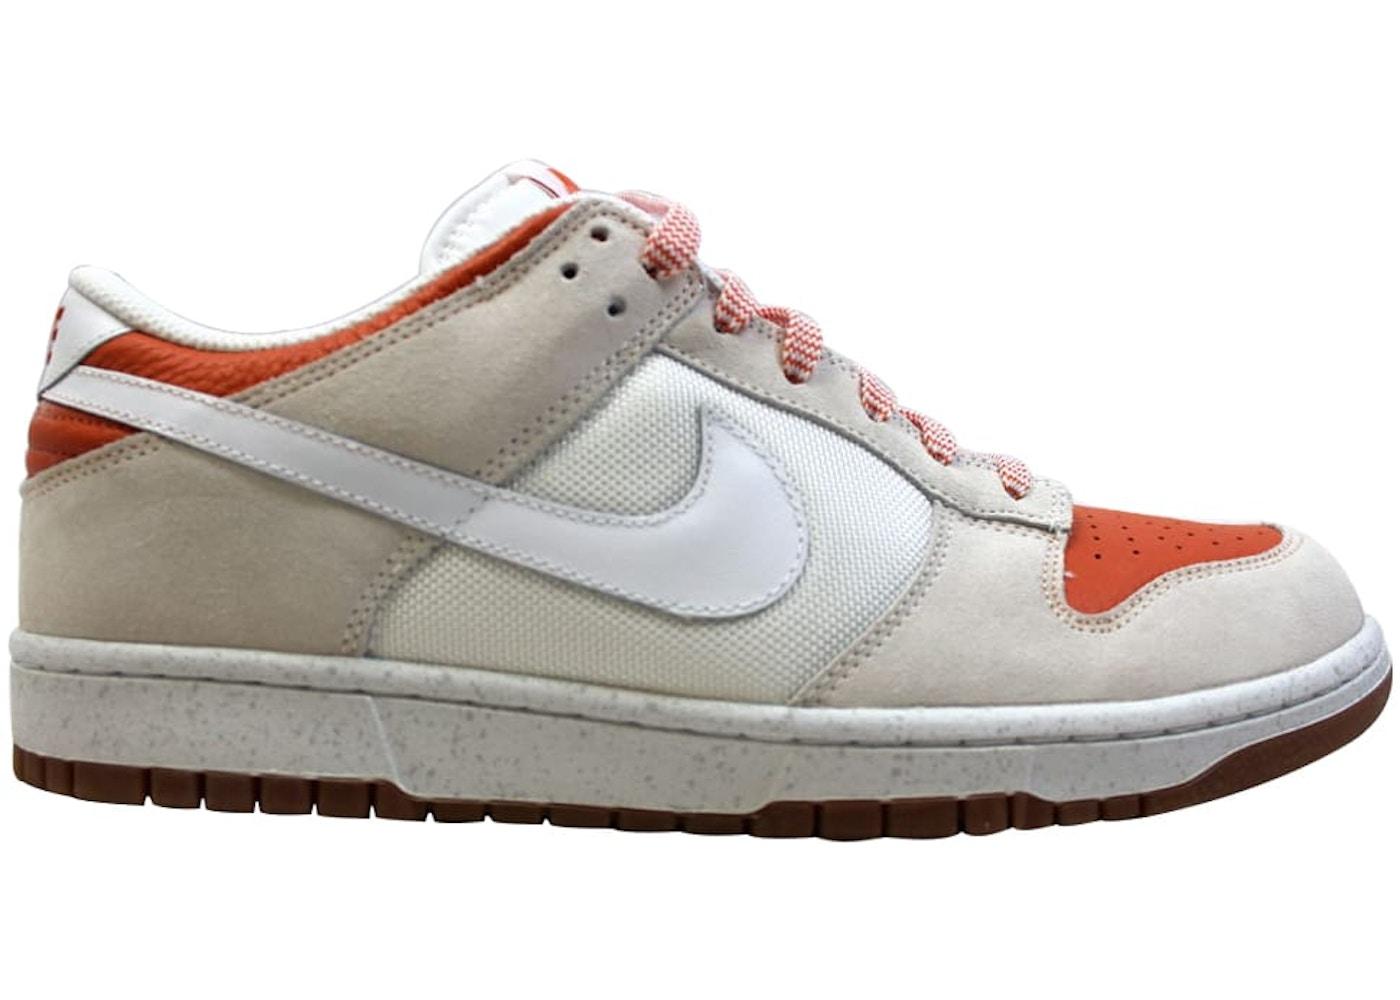 buy online 59b0e b2ac7 Nike Dunk Low Cl WhiteWhite-Hoop Orange - 318020-111